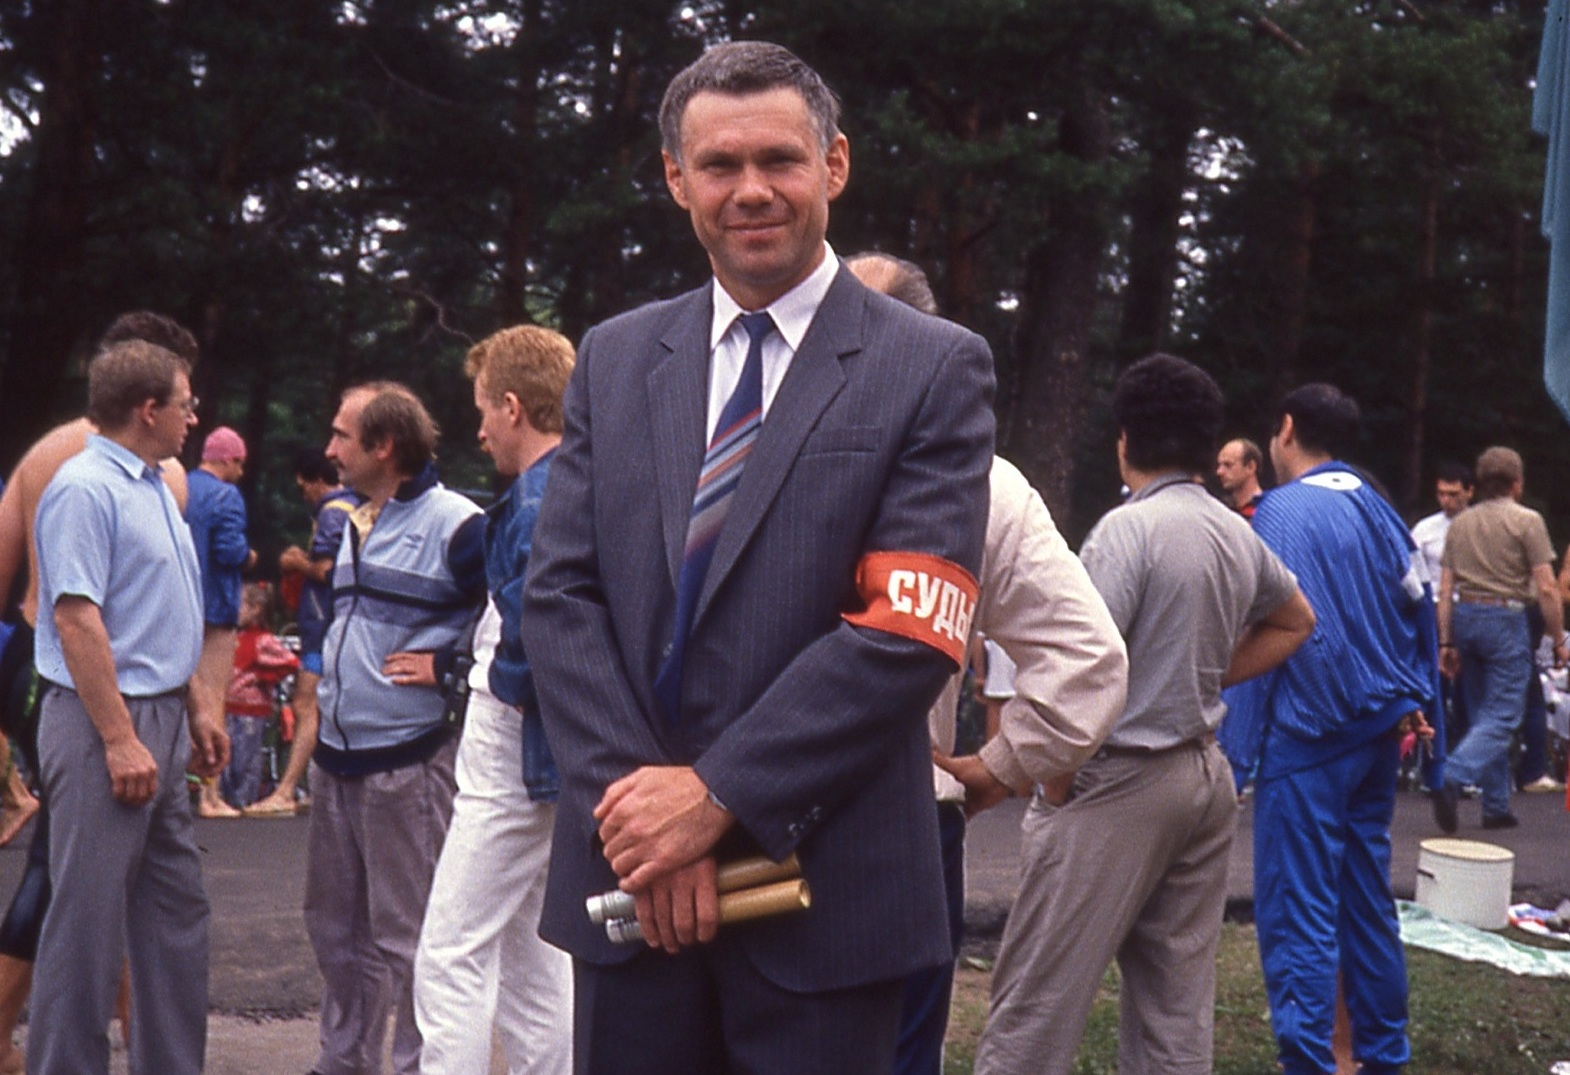 Soviet race official, Zelenogorsk.